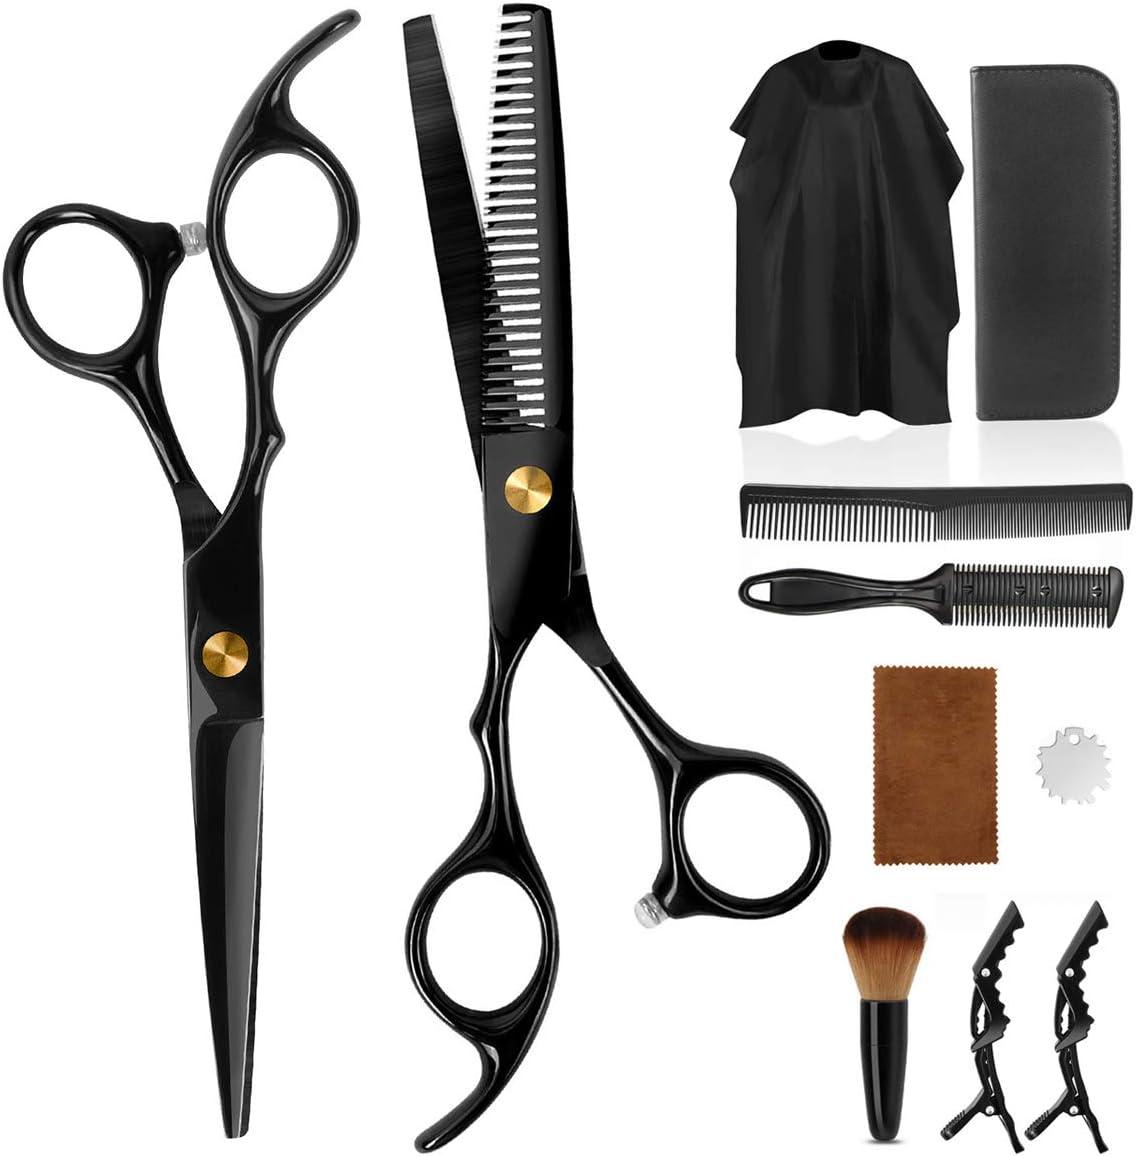 Amazon.com: AODOOR Hair Cutting Scissors Set, Haircut Scissors Kit